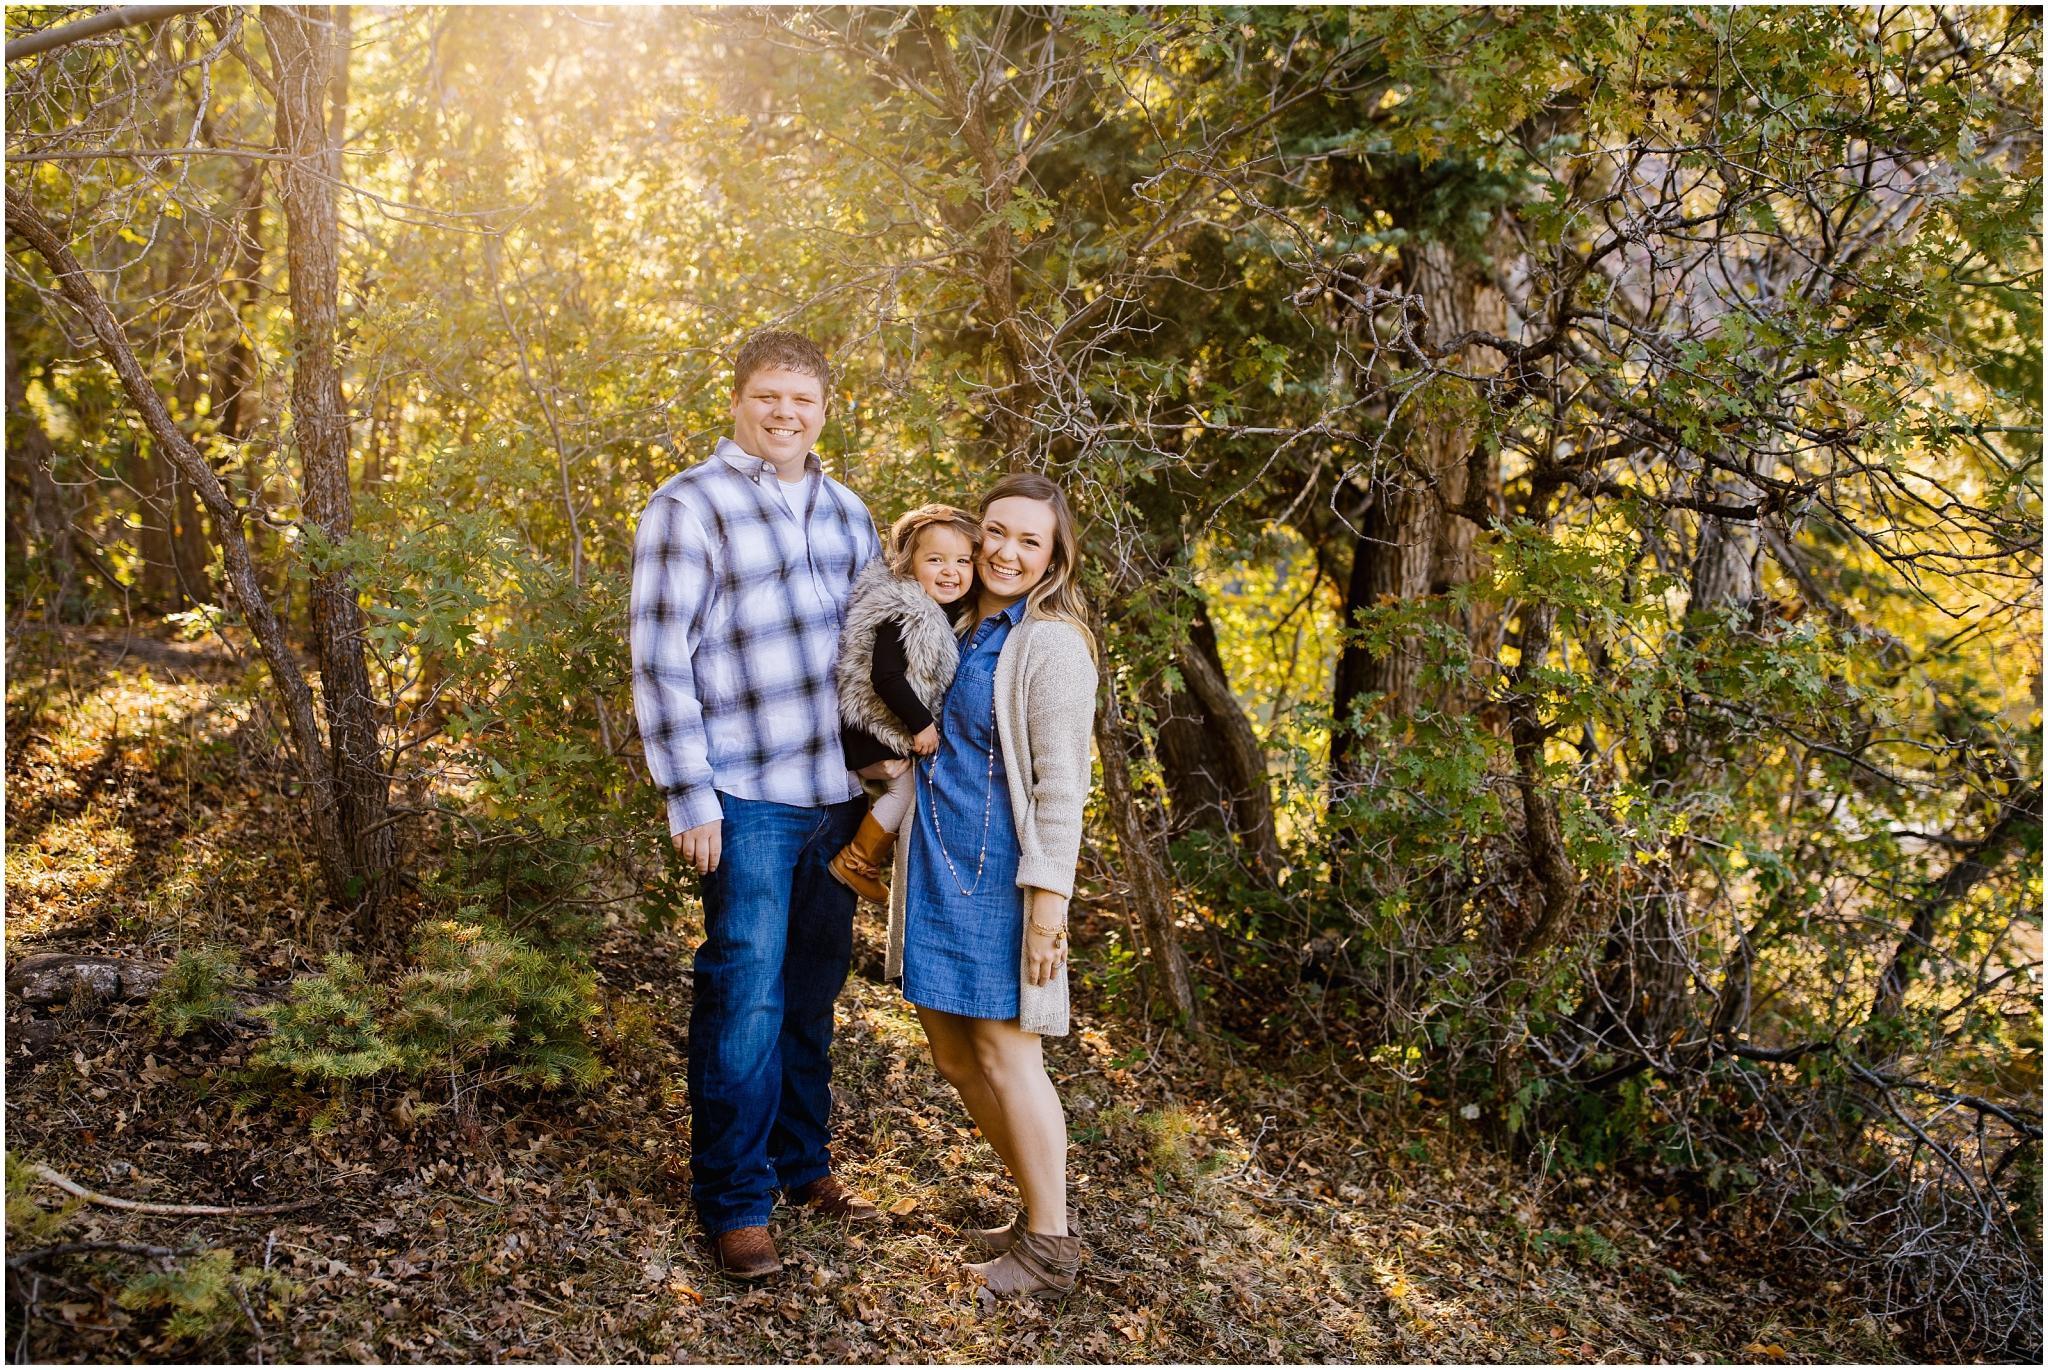 Frandsen-3_Lizzie-B-Imagery-Utah-Family-Photographer-Utah-County-Central-Utah-Park-City-Salt-Lake-City.jpg